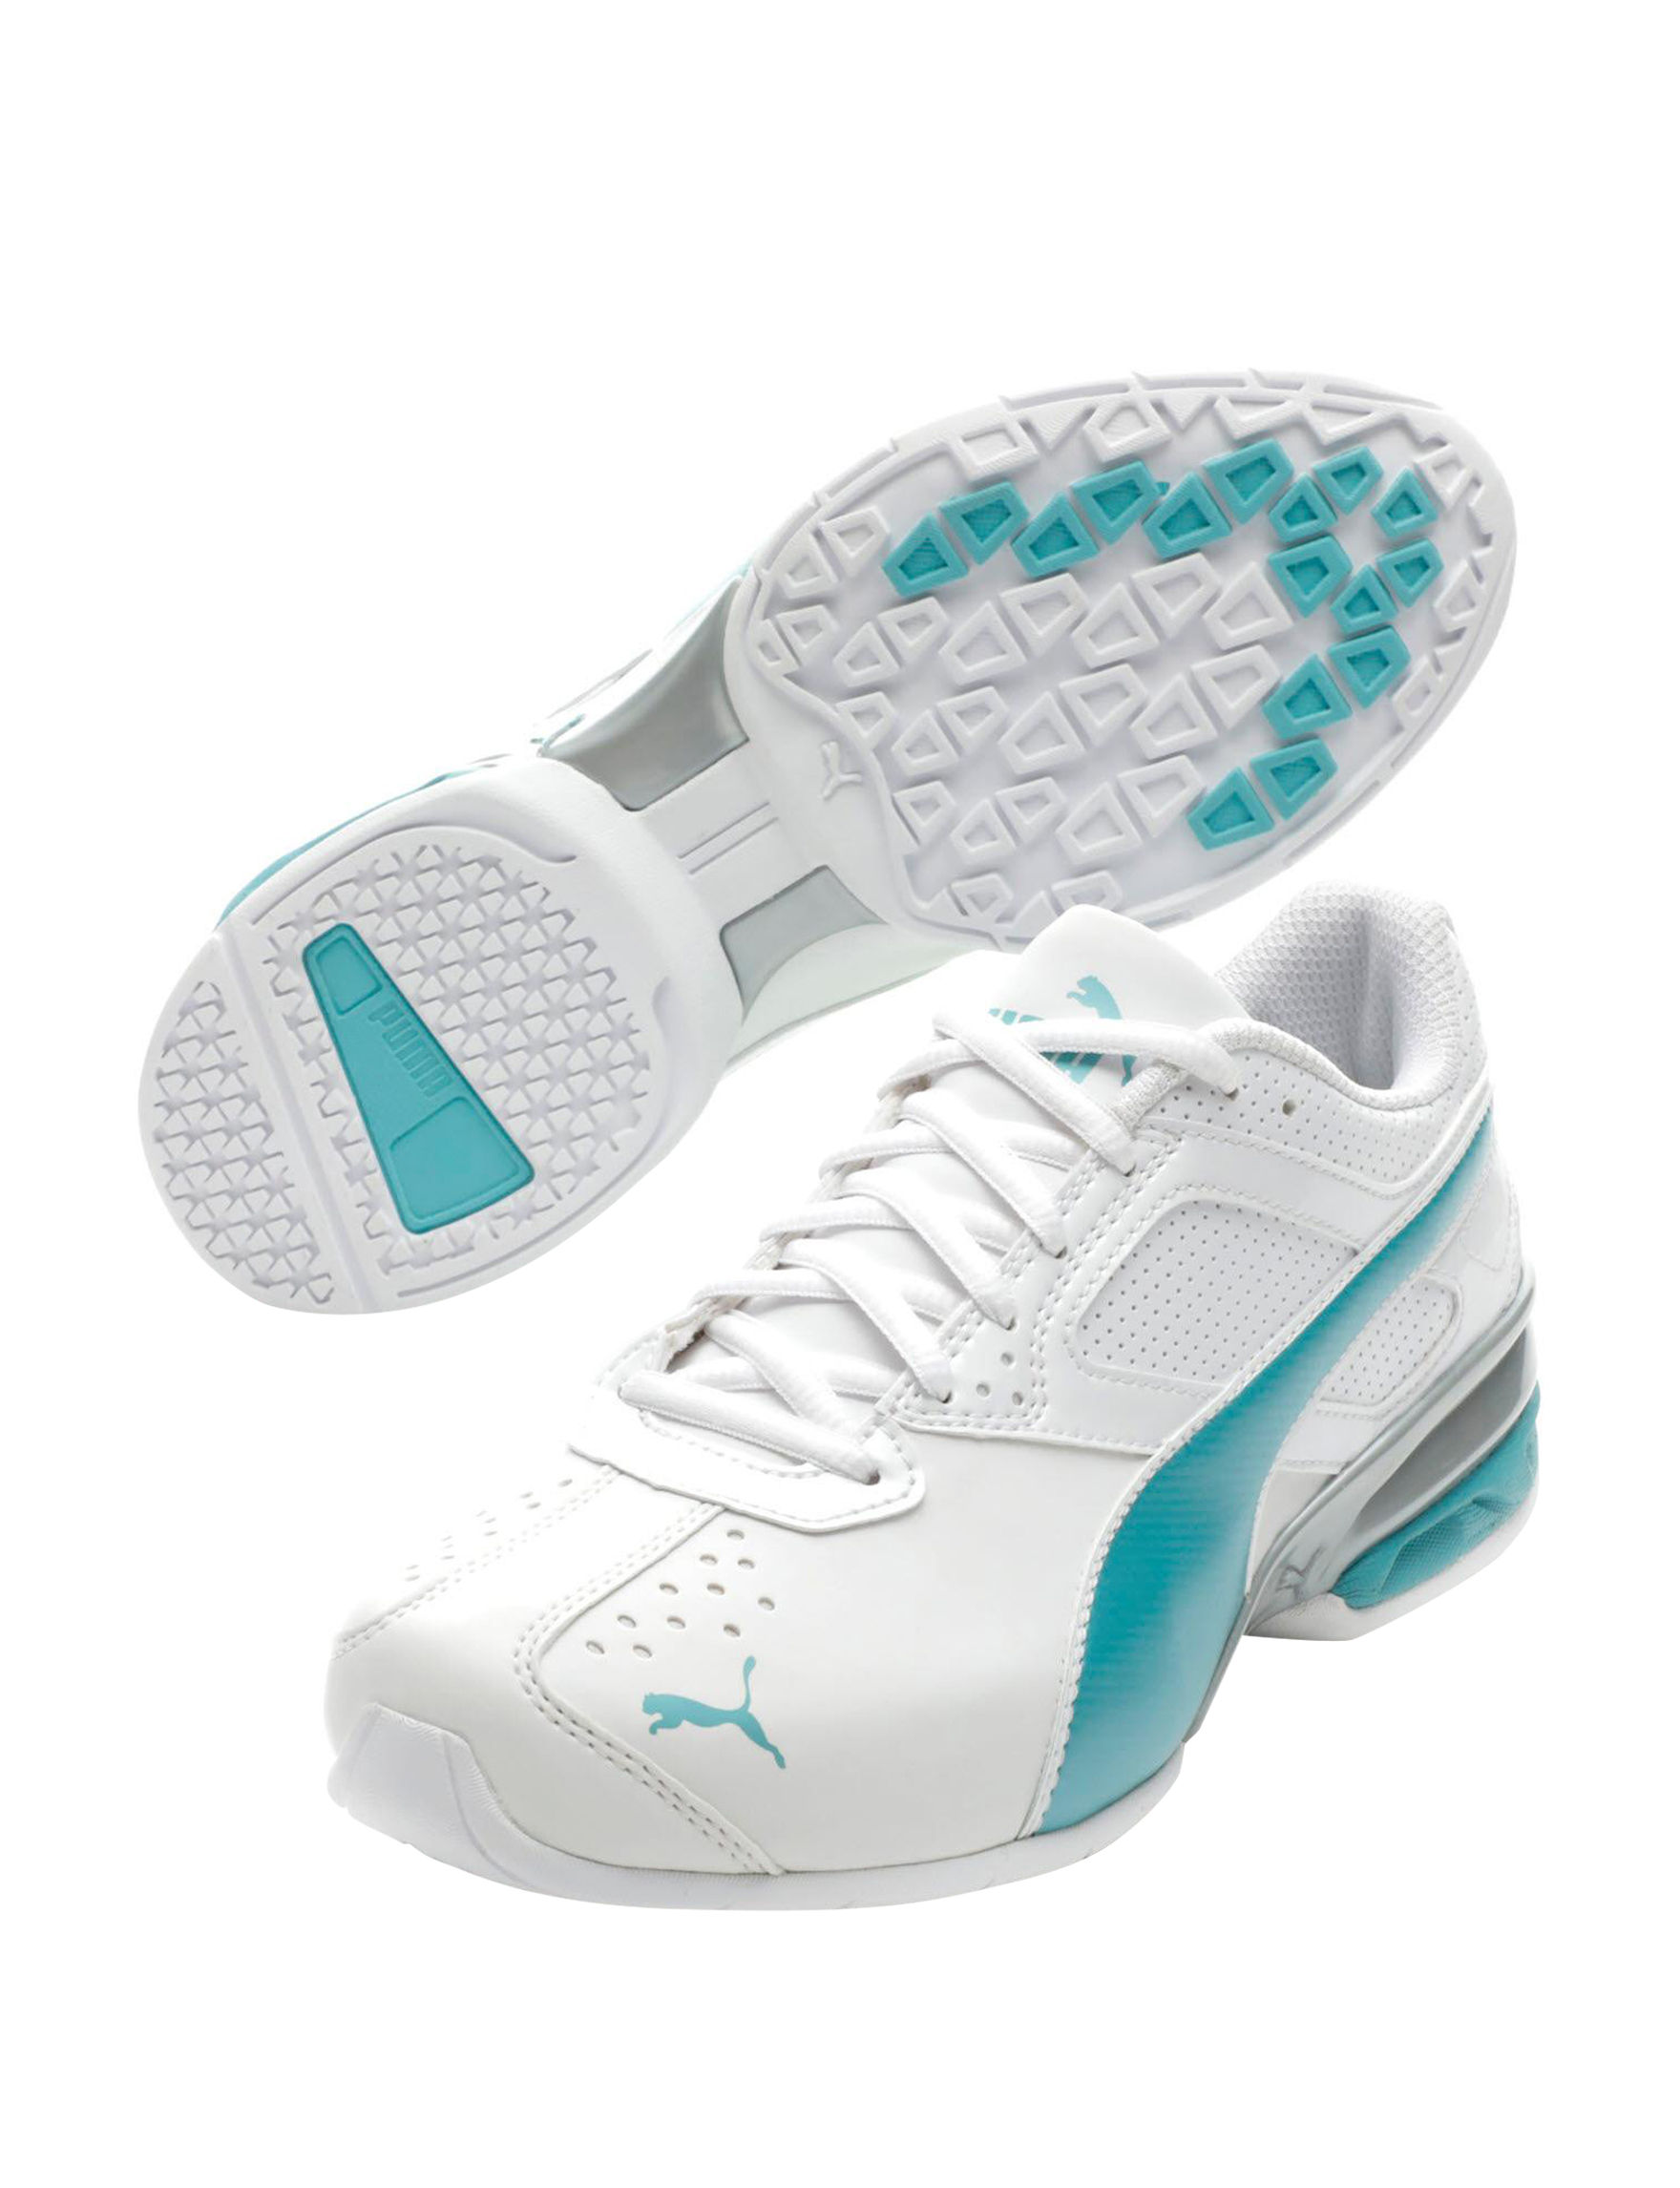 Puma White / Blue Comfort Shoes